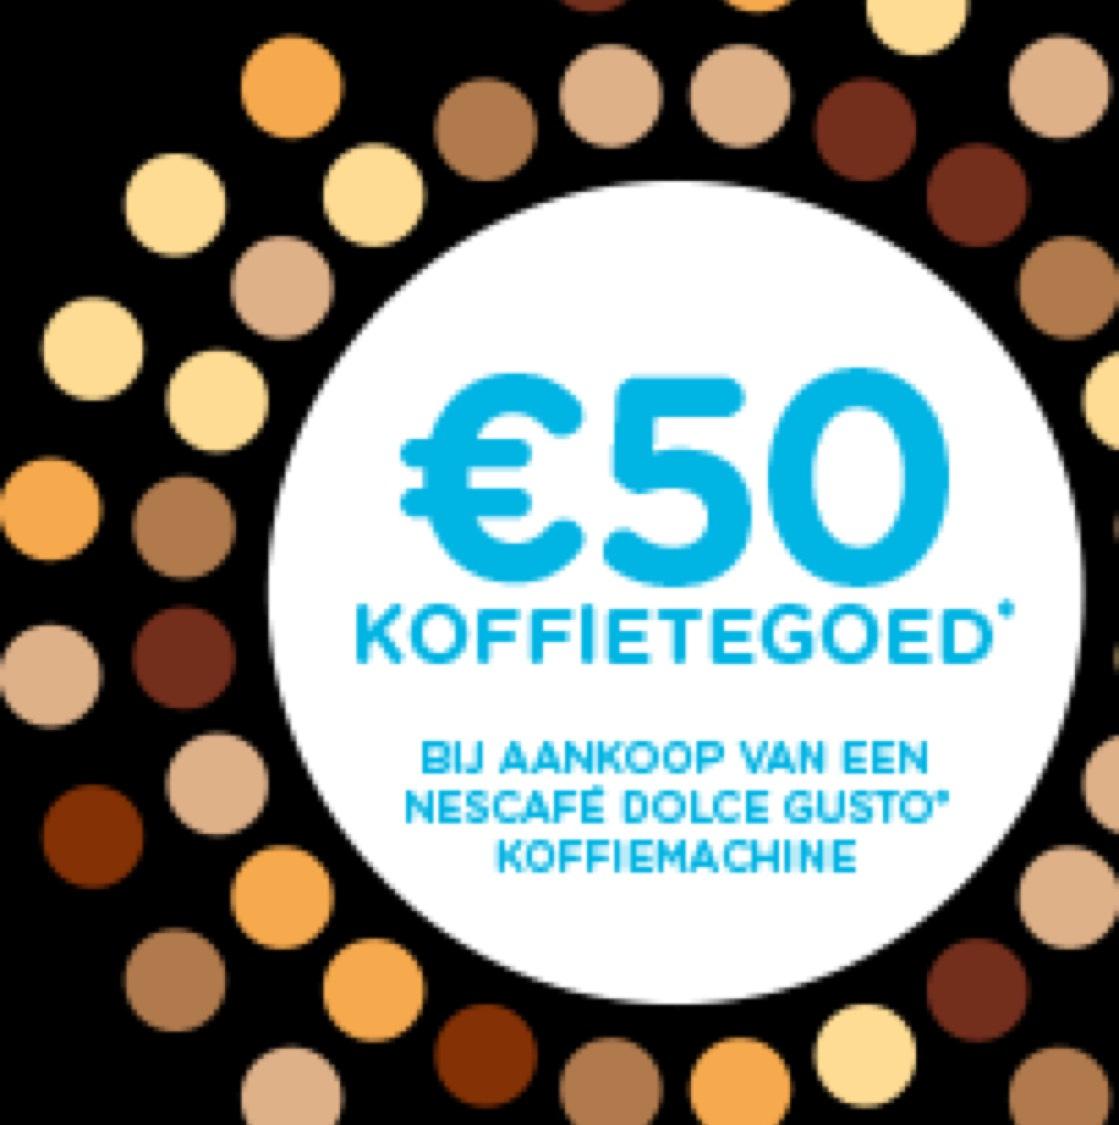 Dolce Gusto €50,- koffietegoed